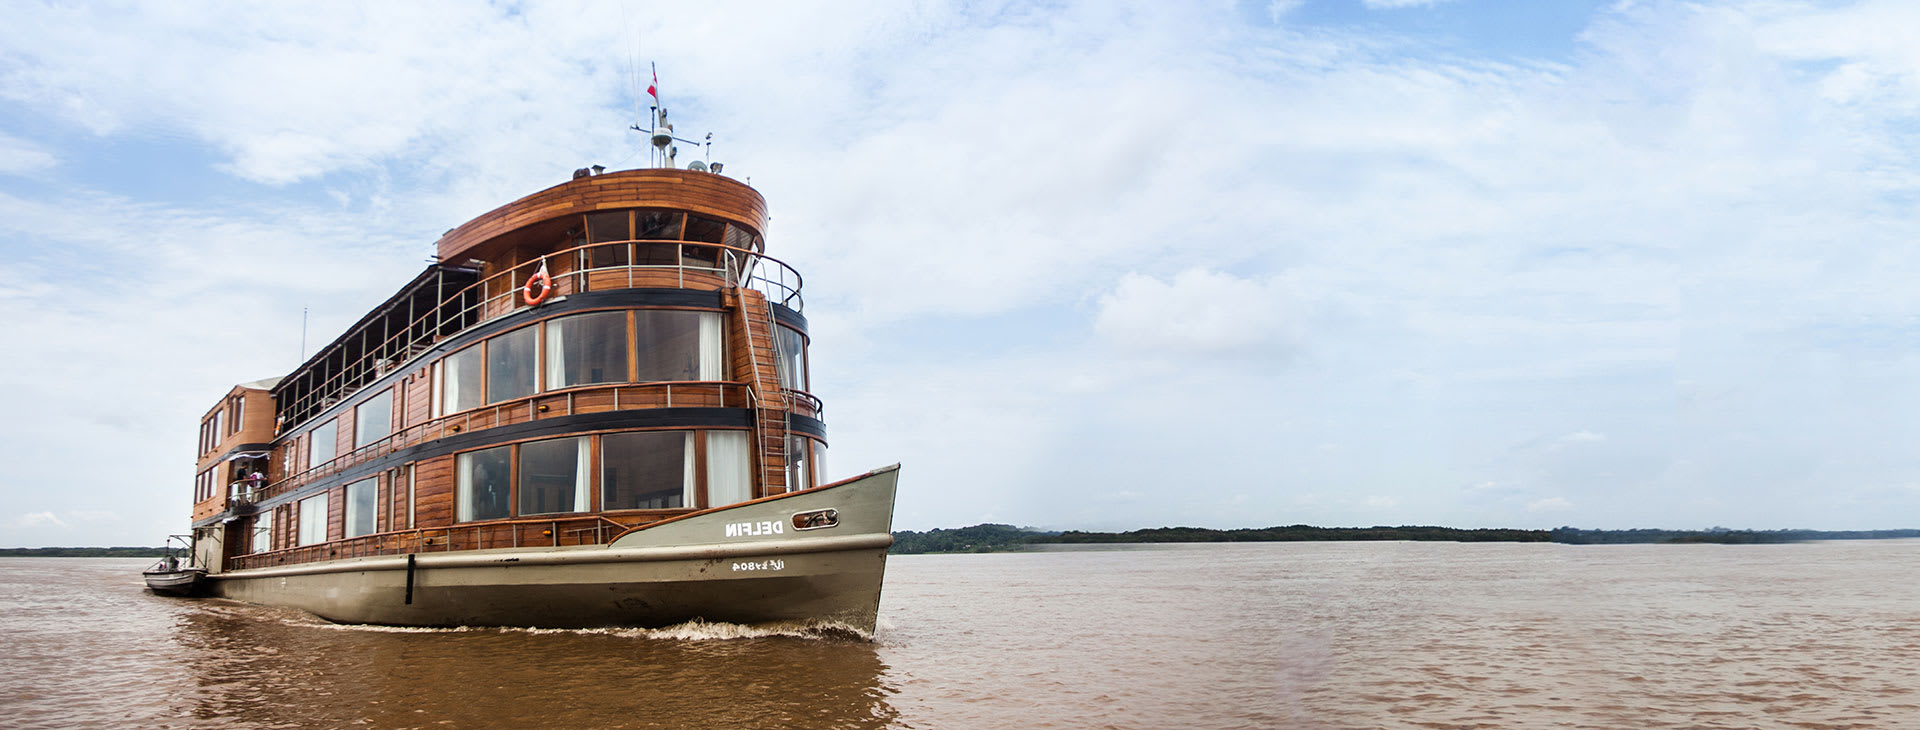 Delfin II on the Amazon river